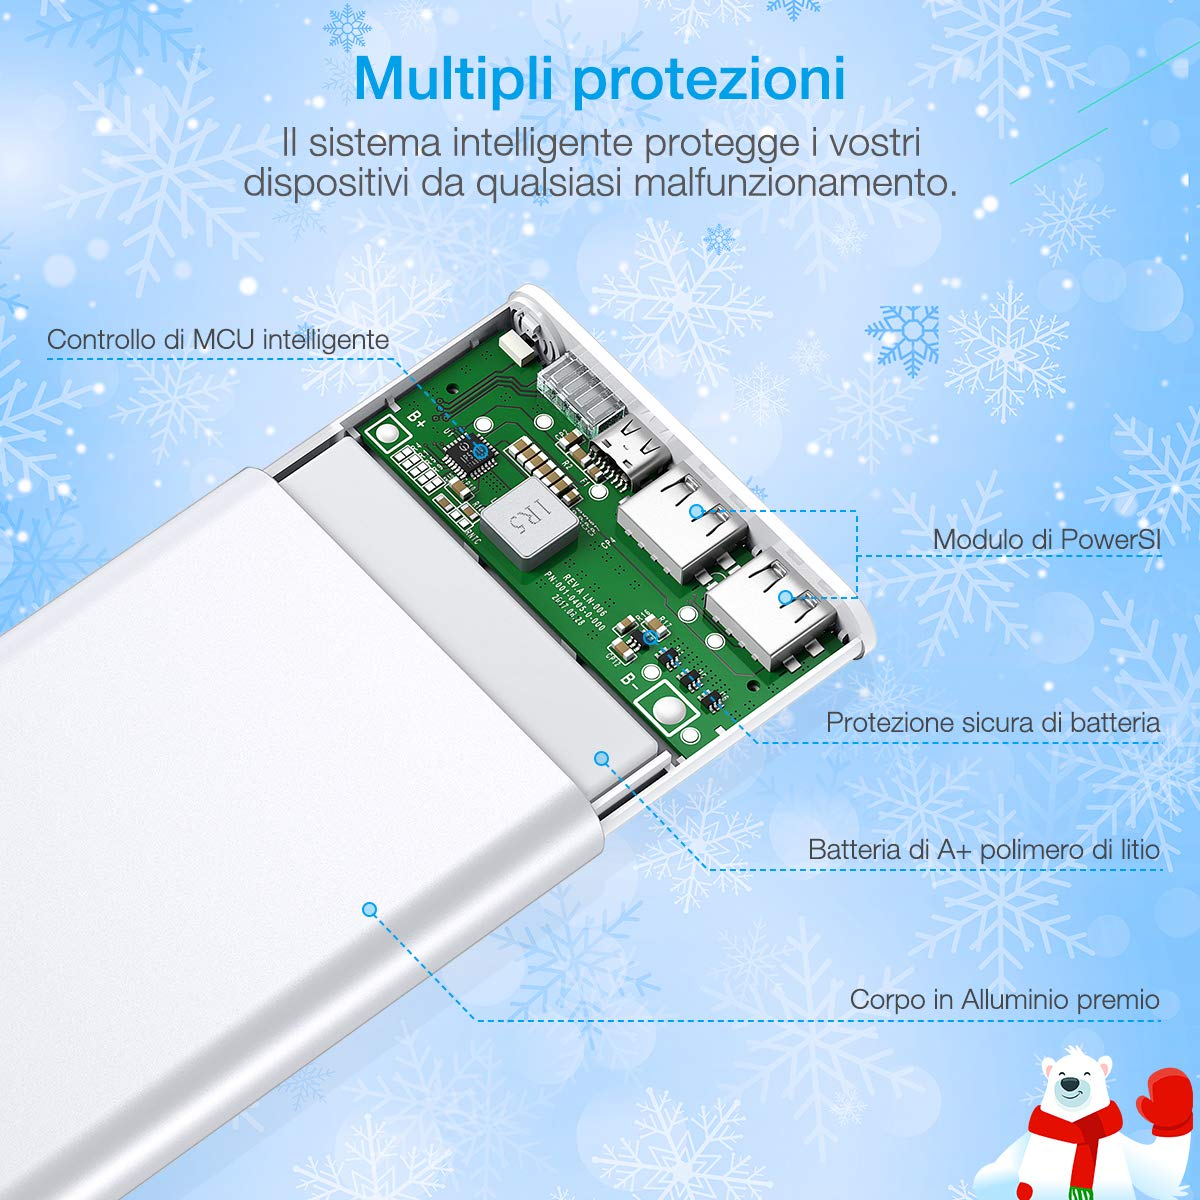 Poweradd Pilot 2GS 10,000mAh Caricabatterie portatile due porte Power Bank Batteria Esterna per iPhone, iPad, iPod, Samsung e tanti altri Phone